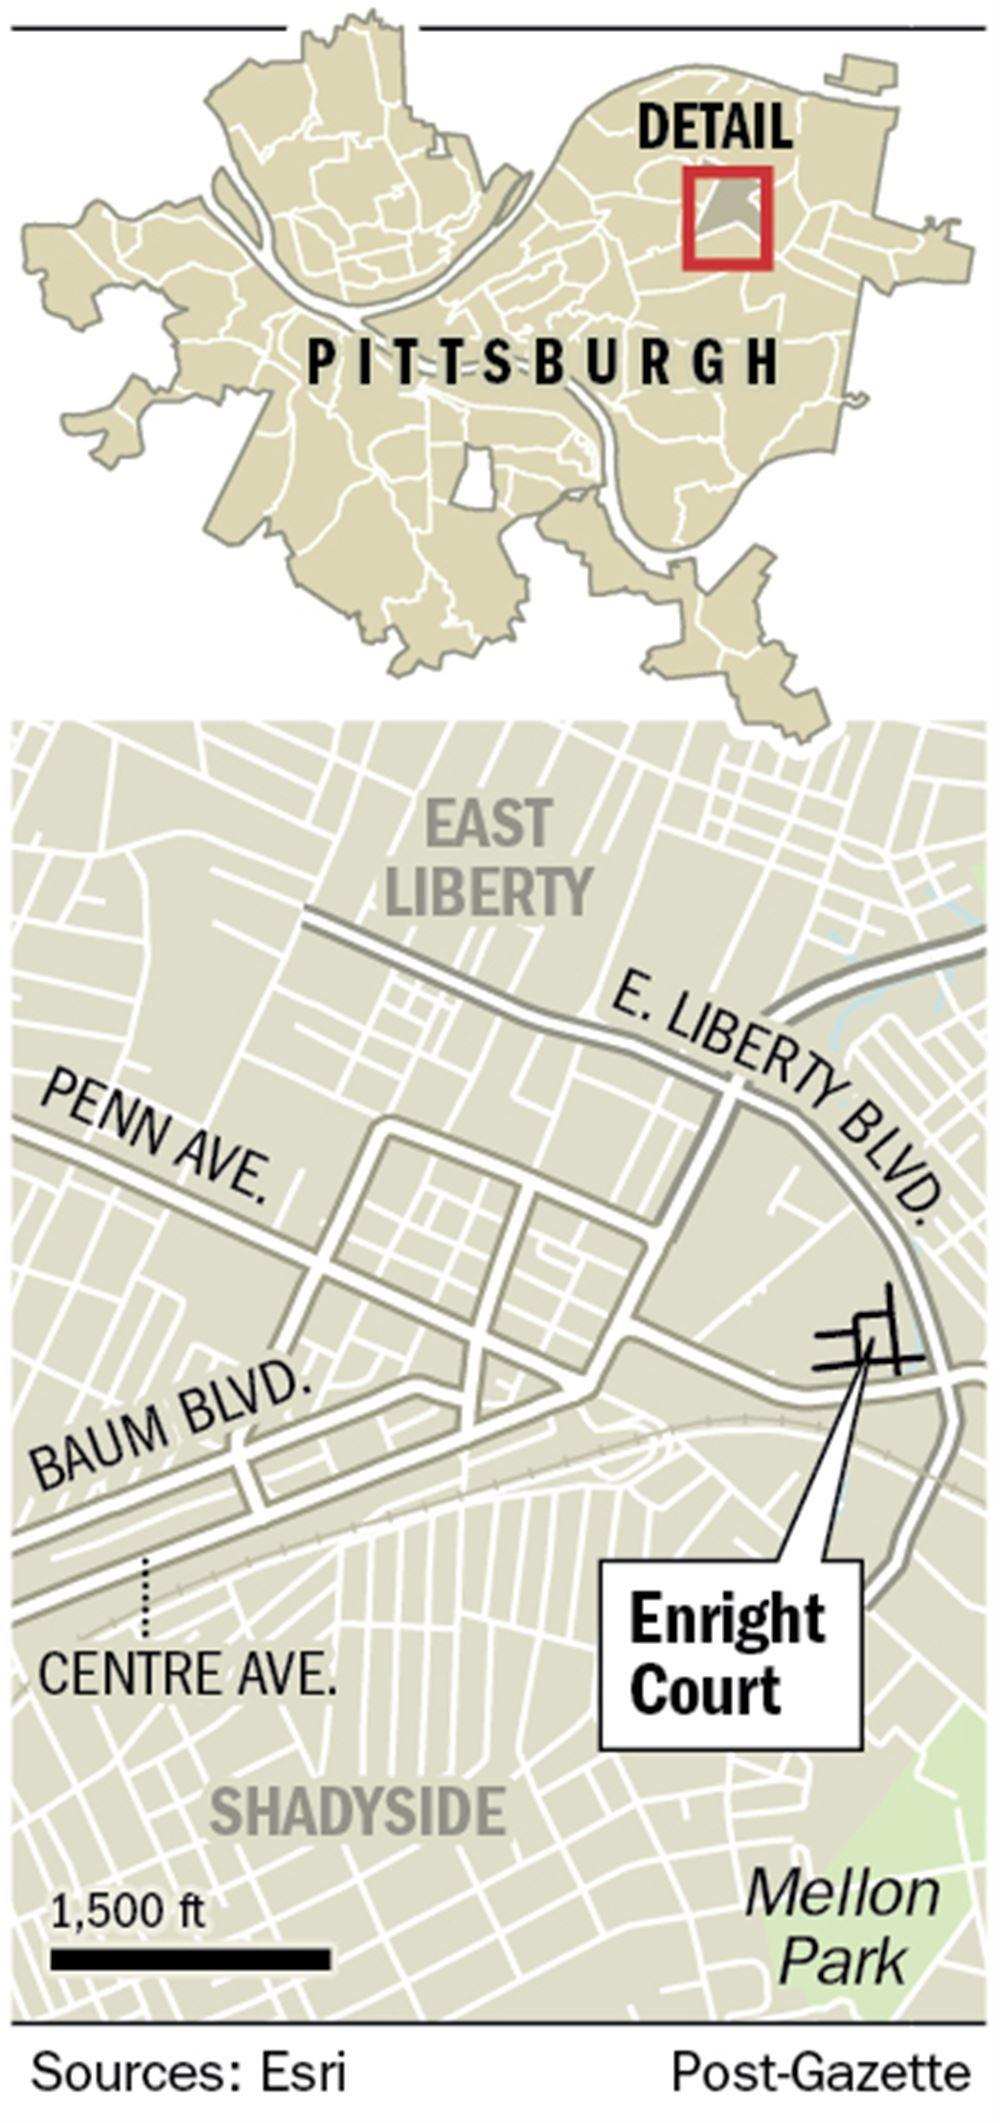 East Liberty's Enright Court remains a modest success